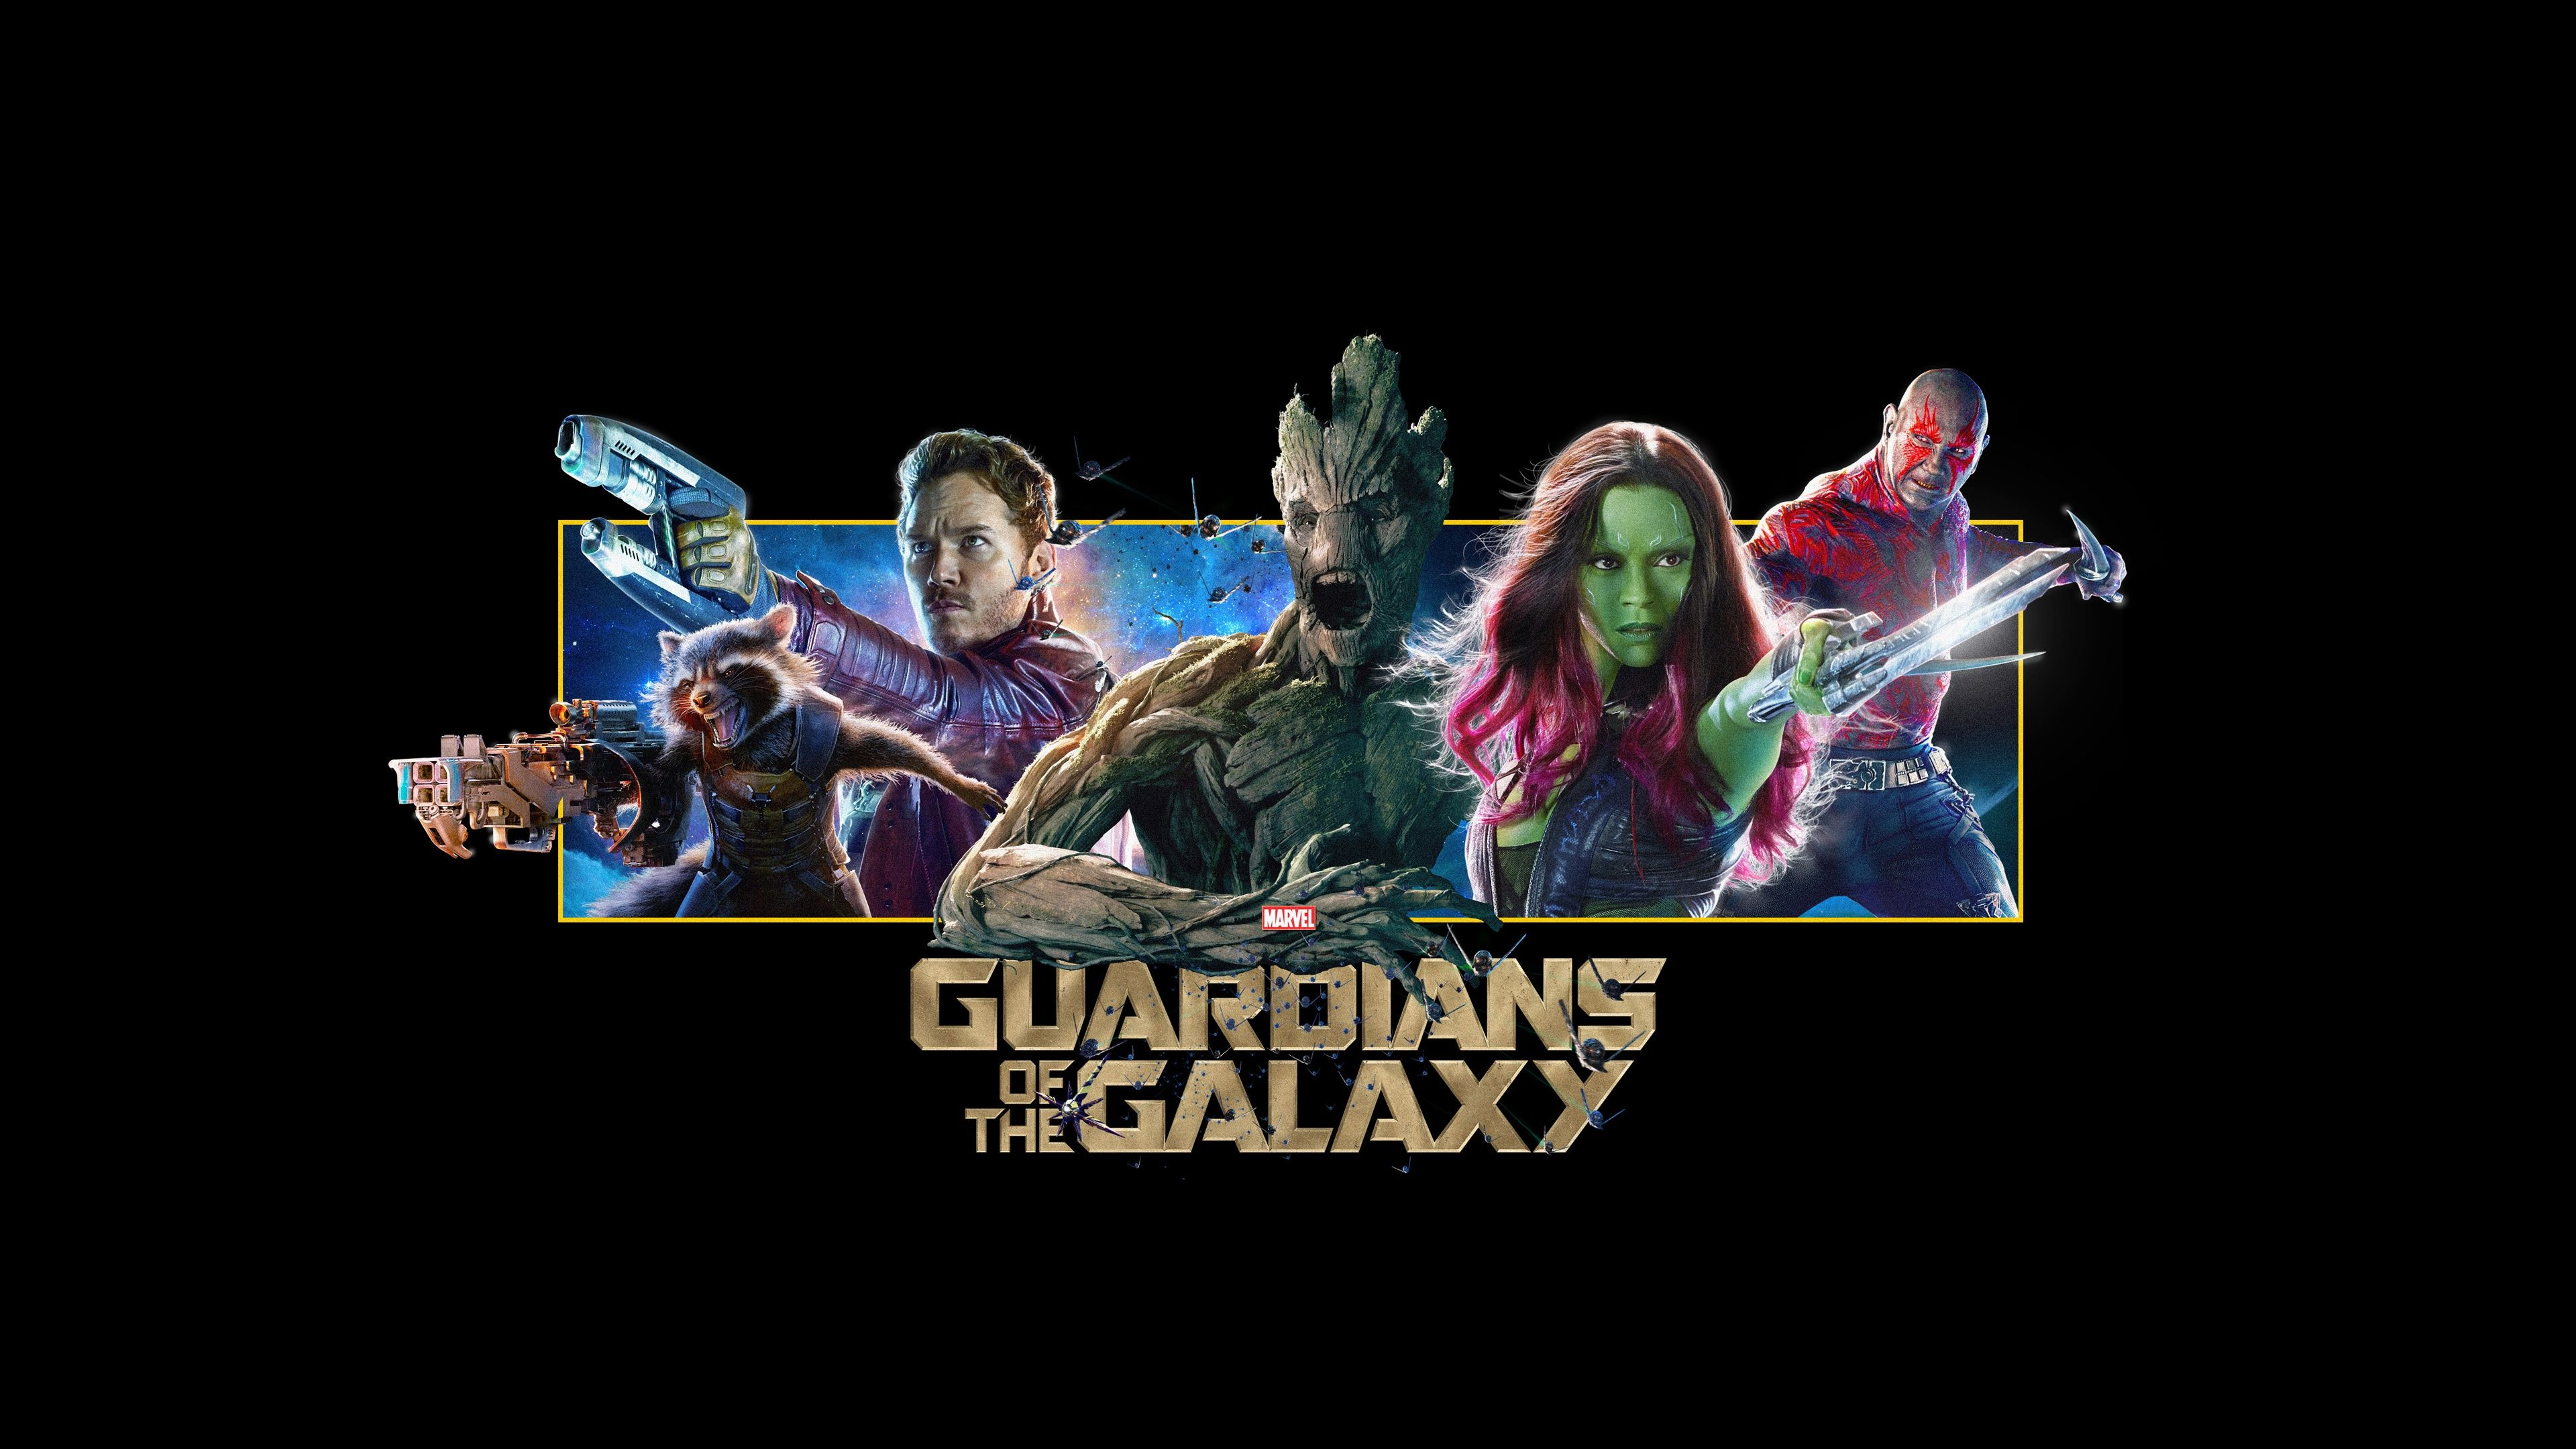 Guardians Of The Galaxy Wallpaper Desktop 296 3840x2160 Px 130 MB Cartoon Movie 1080p 1920x1080